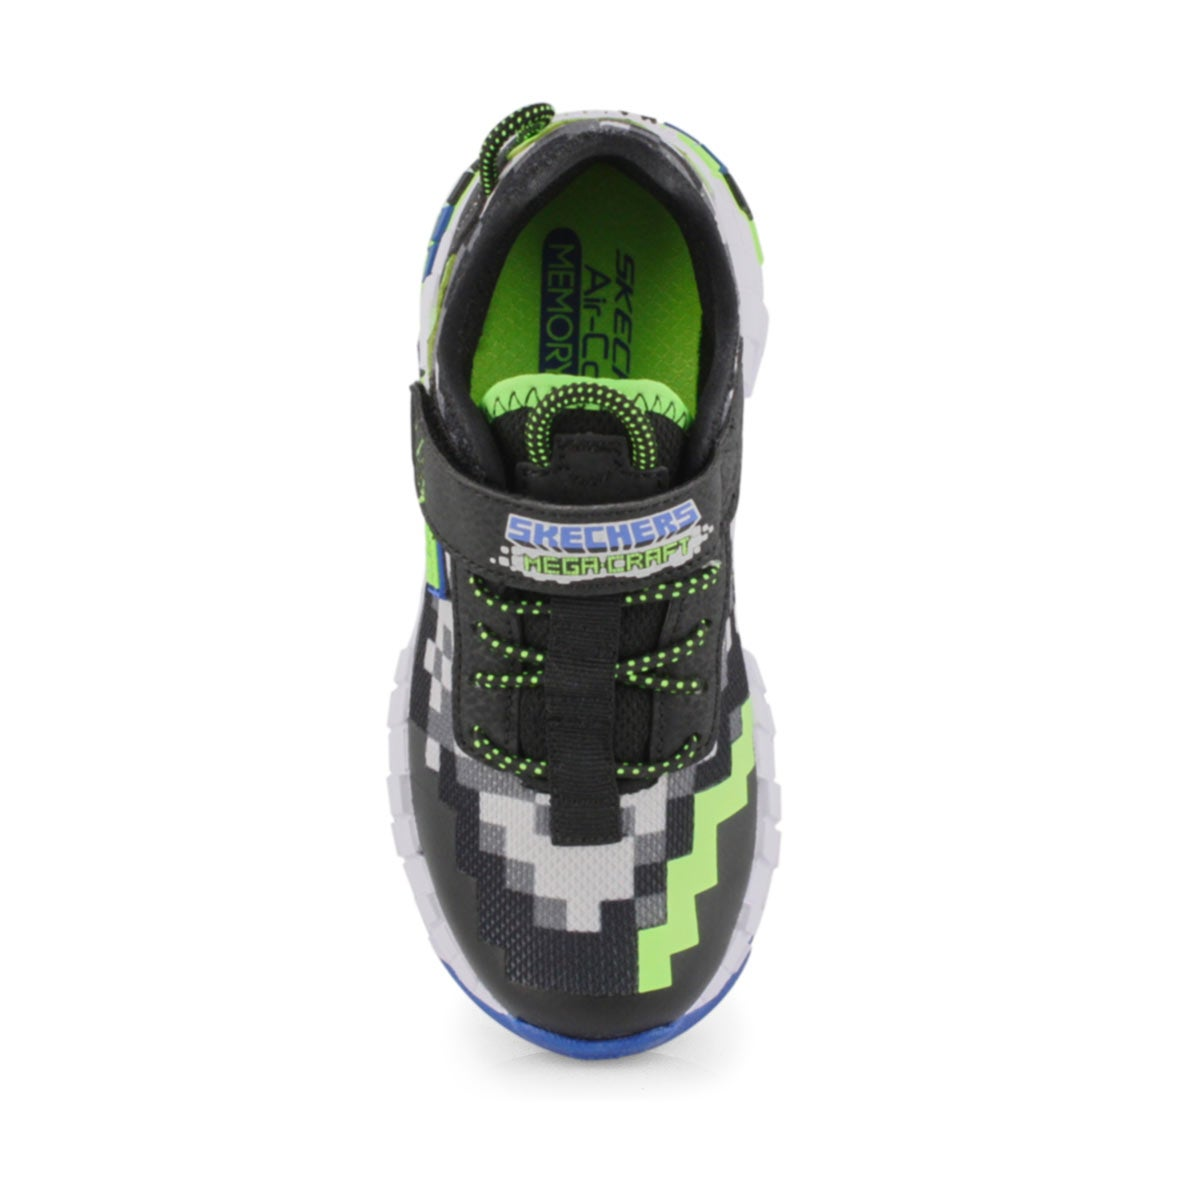 Boys' Mega-Craft Sneakers - Black/Lime